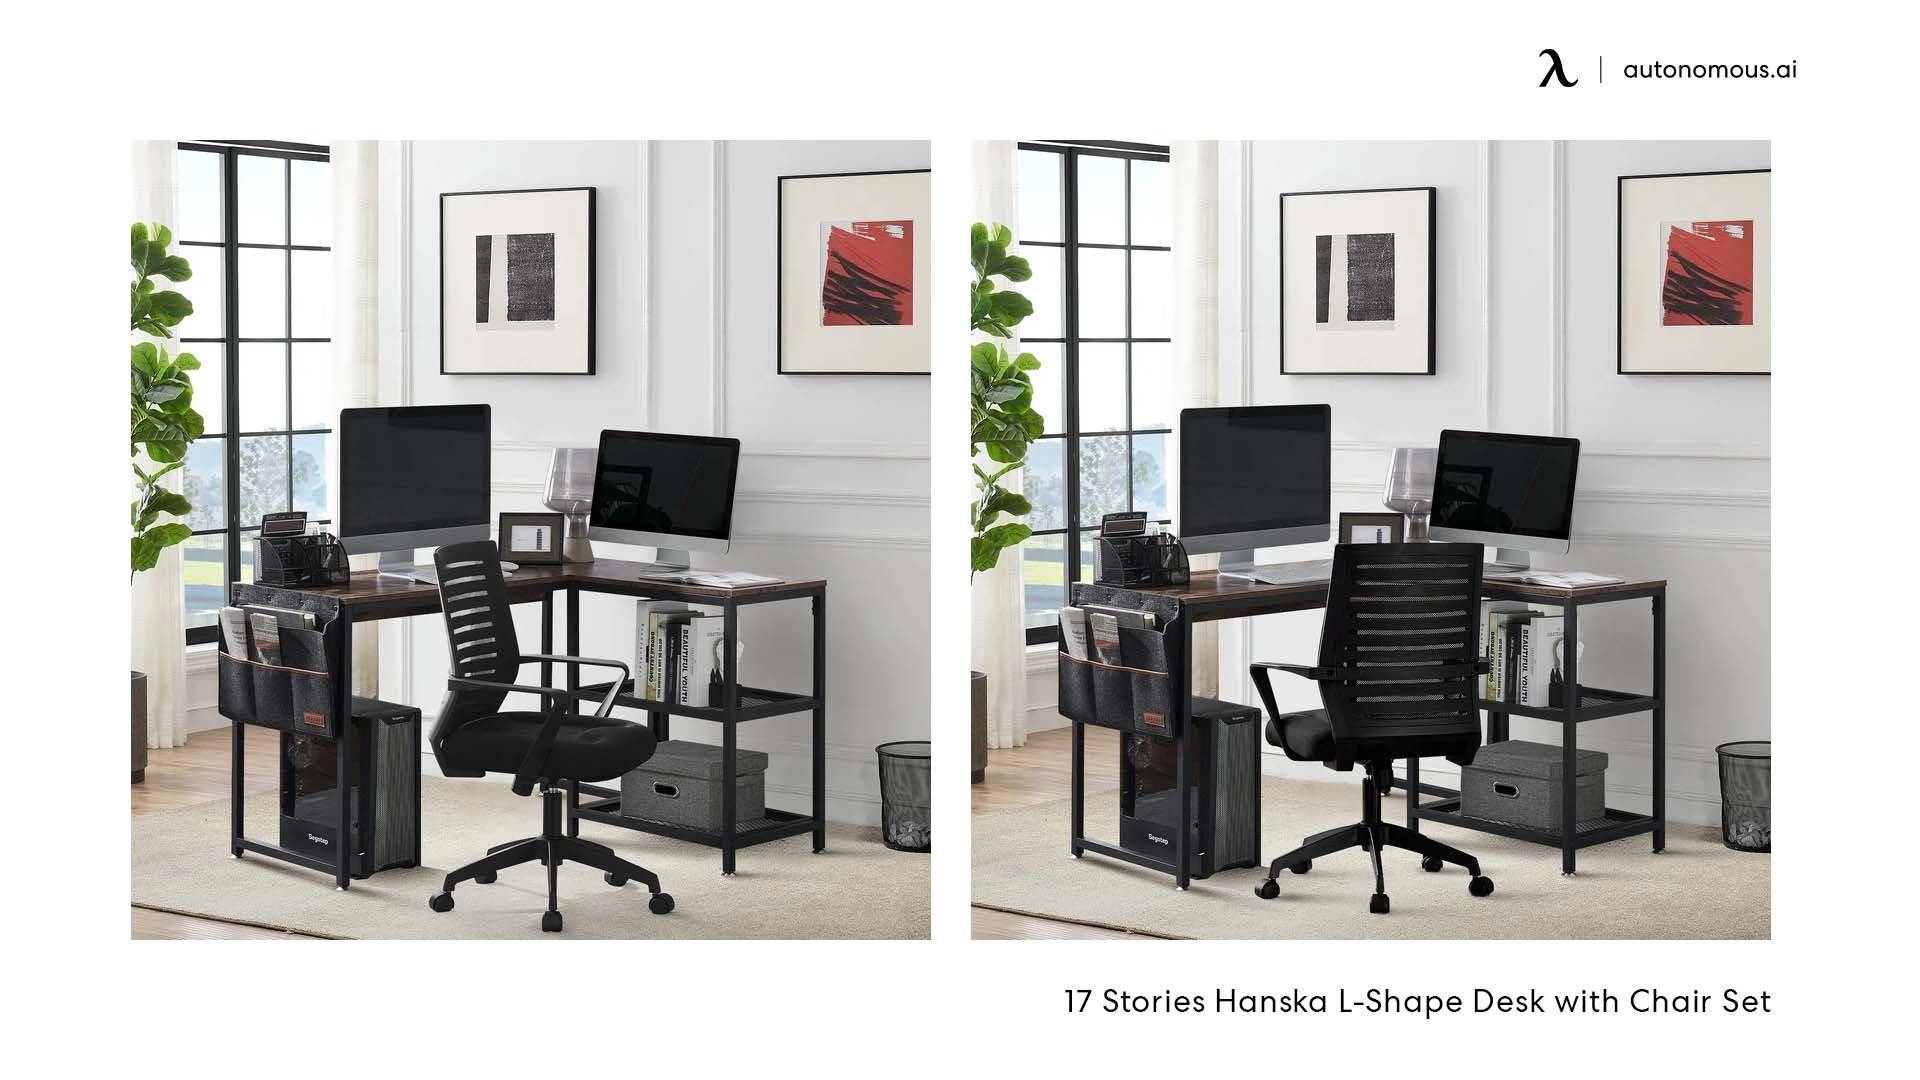 17 Stories Hanska L-Shape Desk with Chair Set